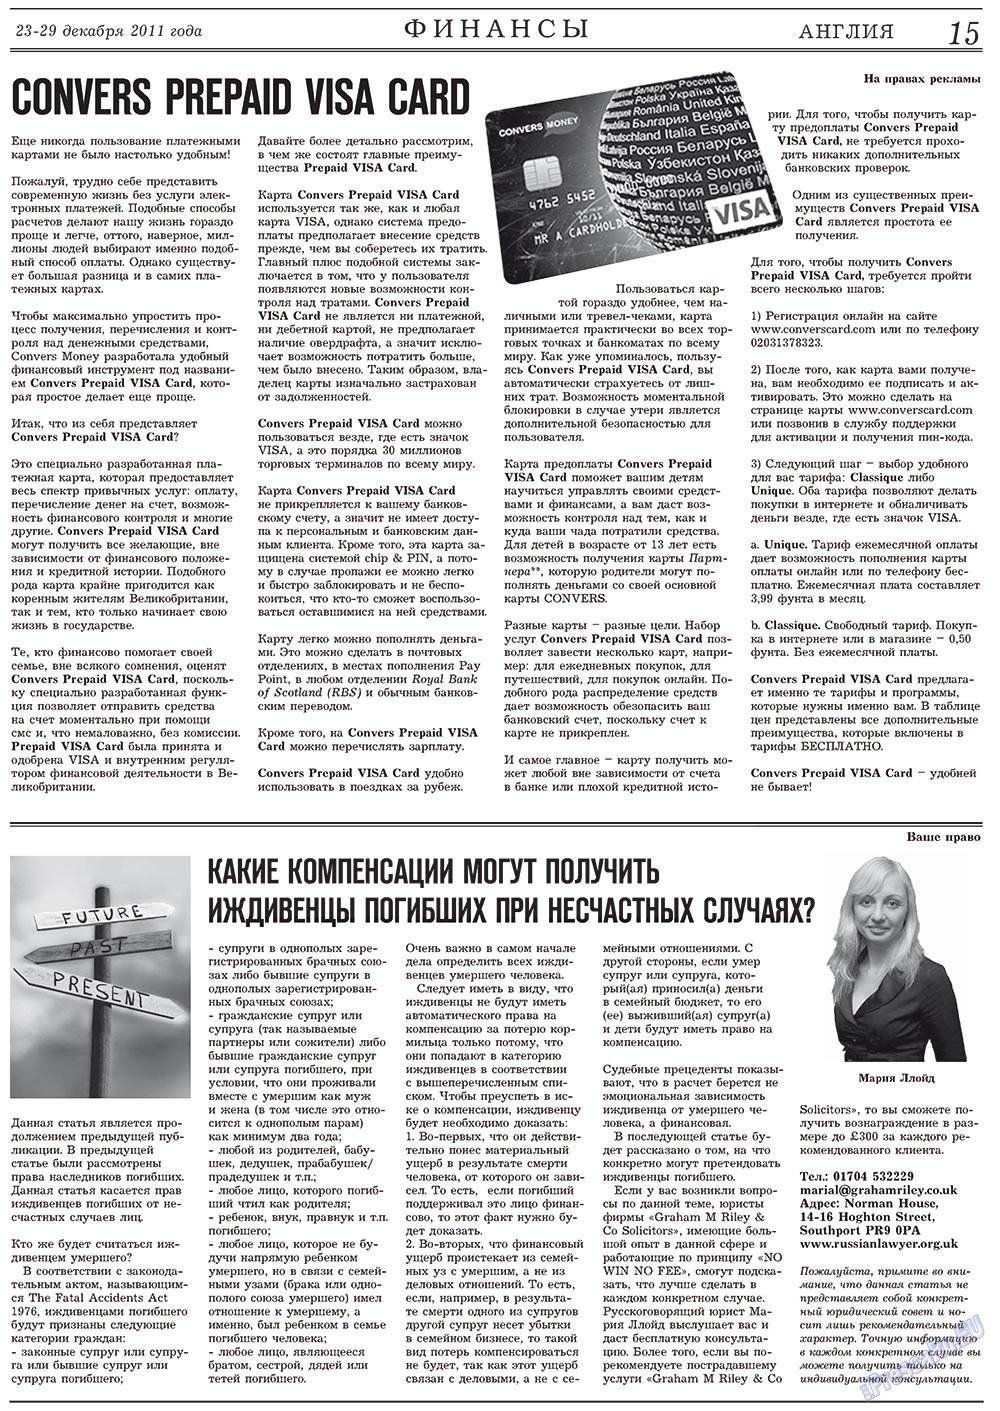 Англия (газета). 2011 год, номер 47, стр. 15